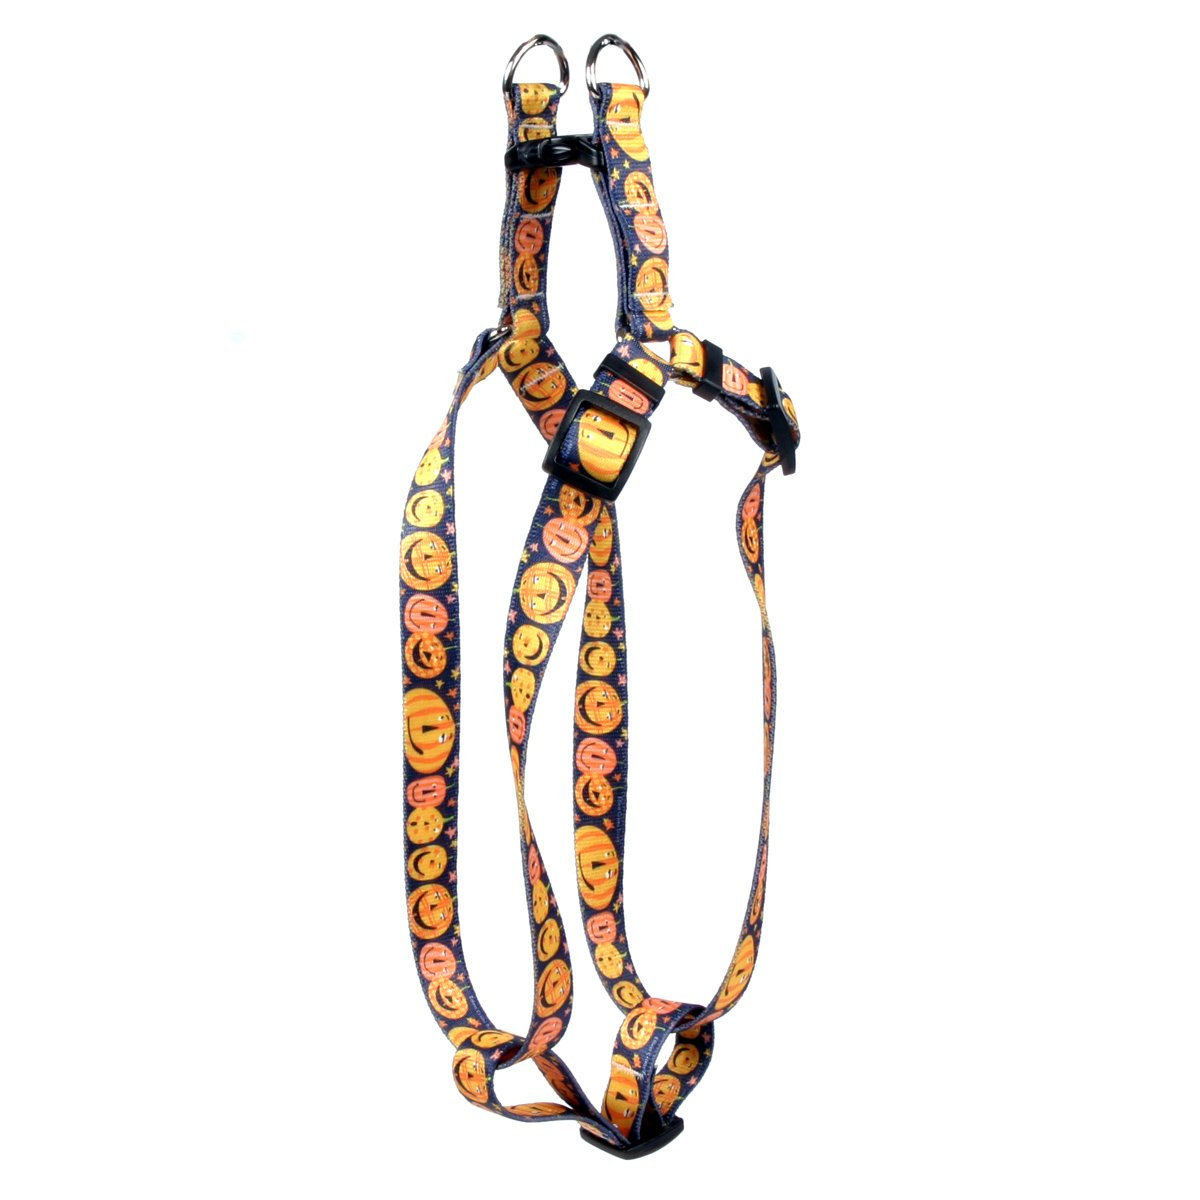 Yellow Dog Design Standard Step-In Harness, Pumpkin Party, Medium 15'' - 25'' by Yellow Dog Design